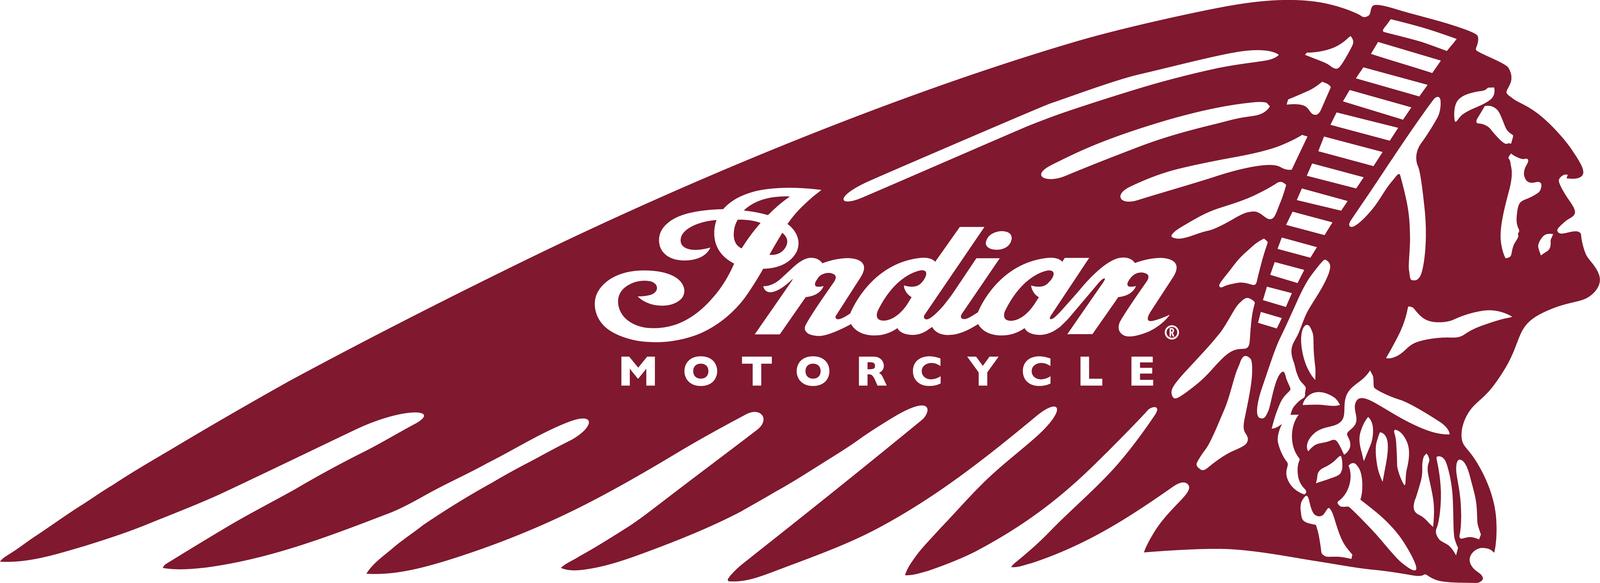 Freedom Indian Motorcycle Of Mckinney Texas Opens Doors